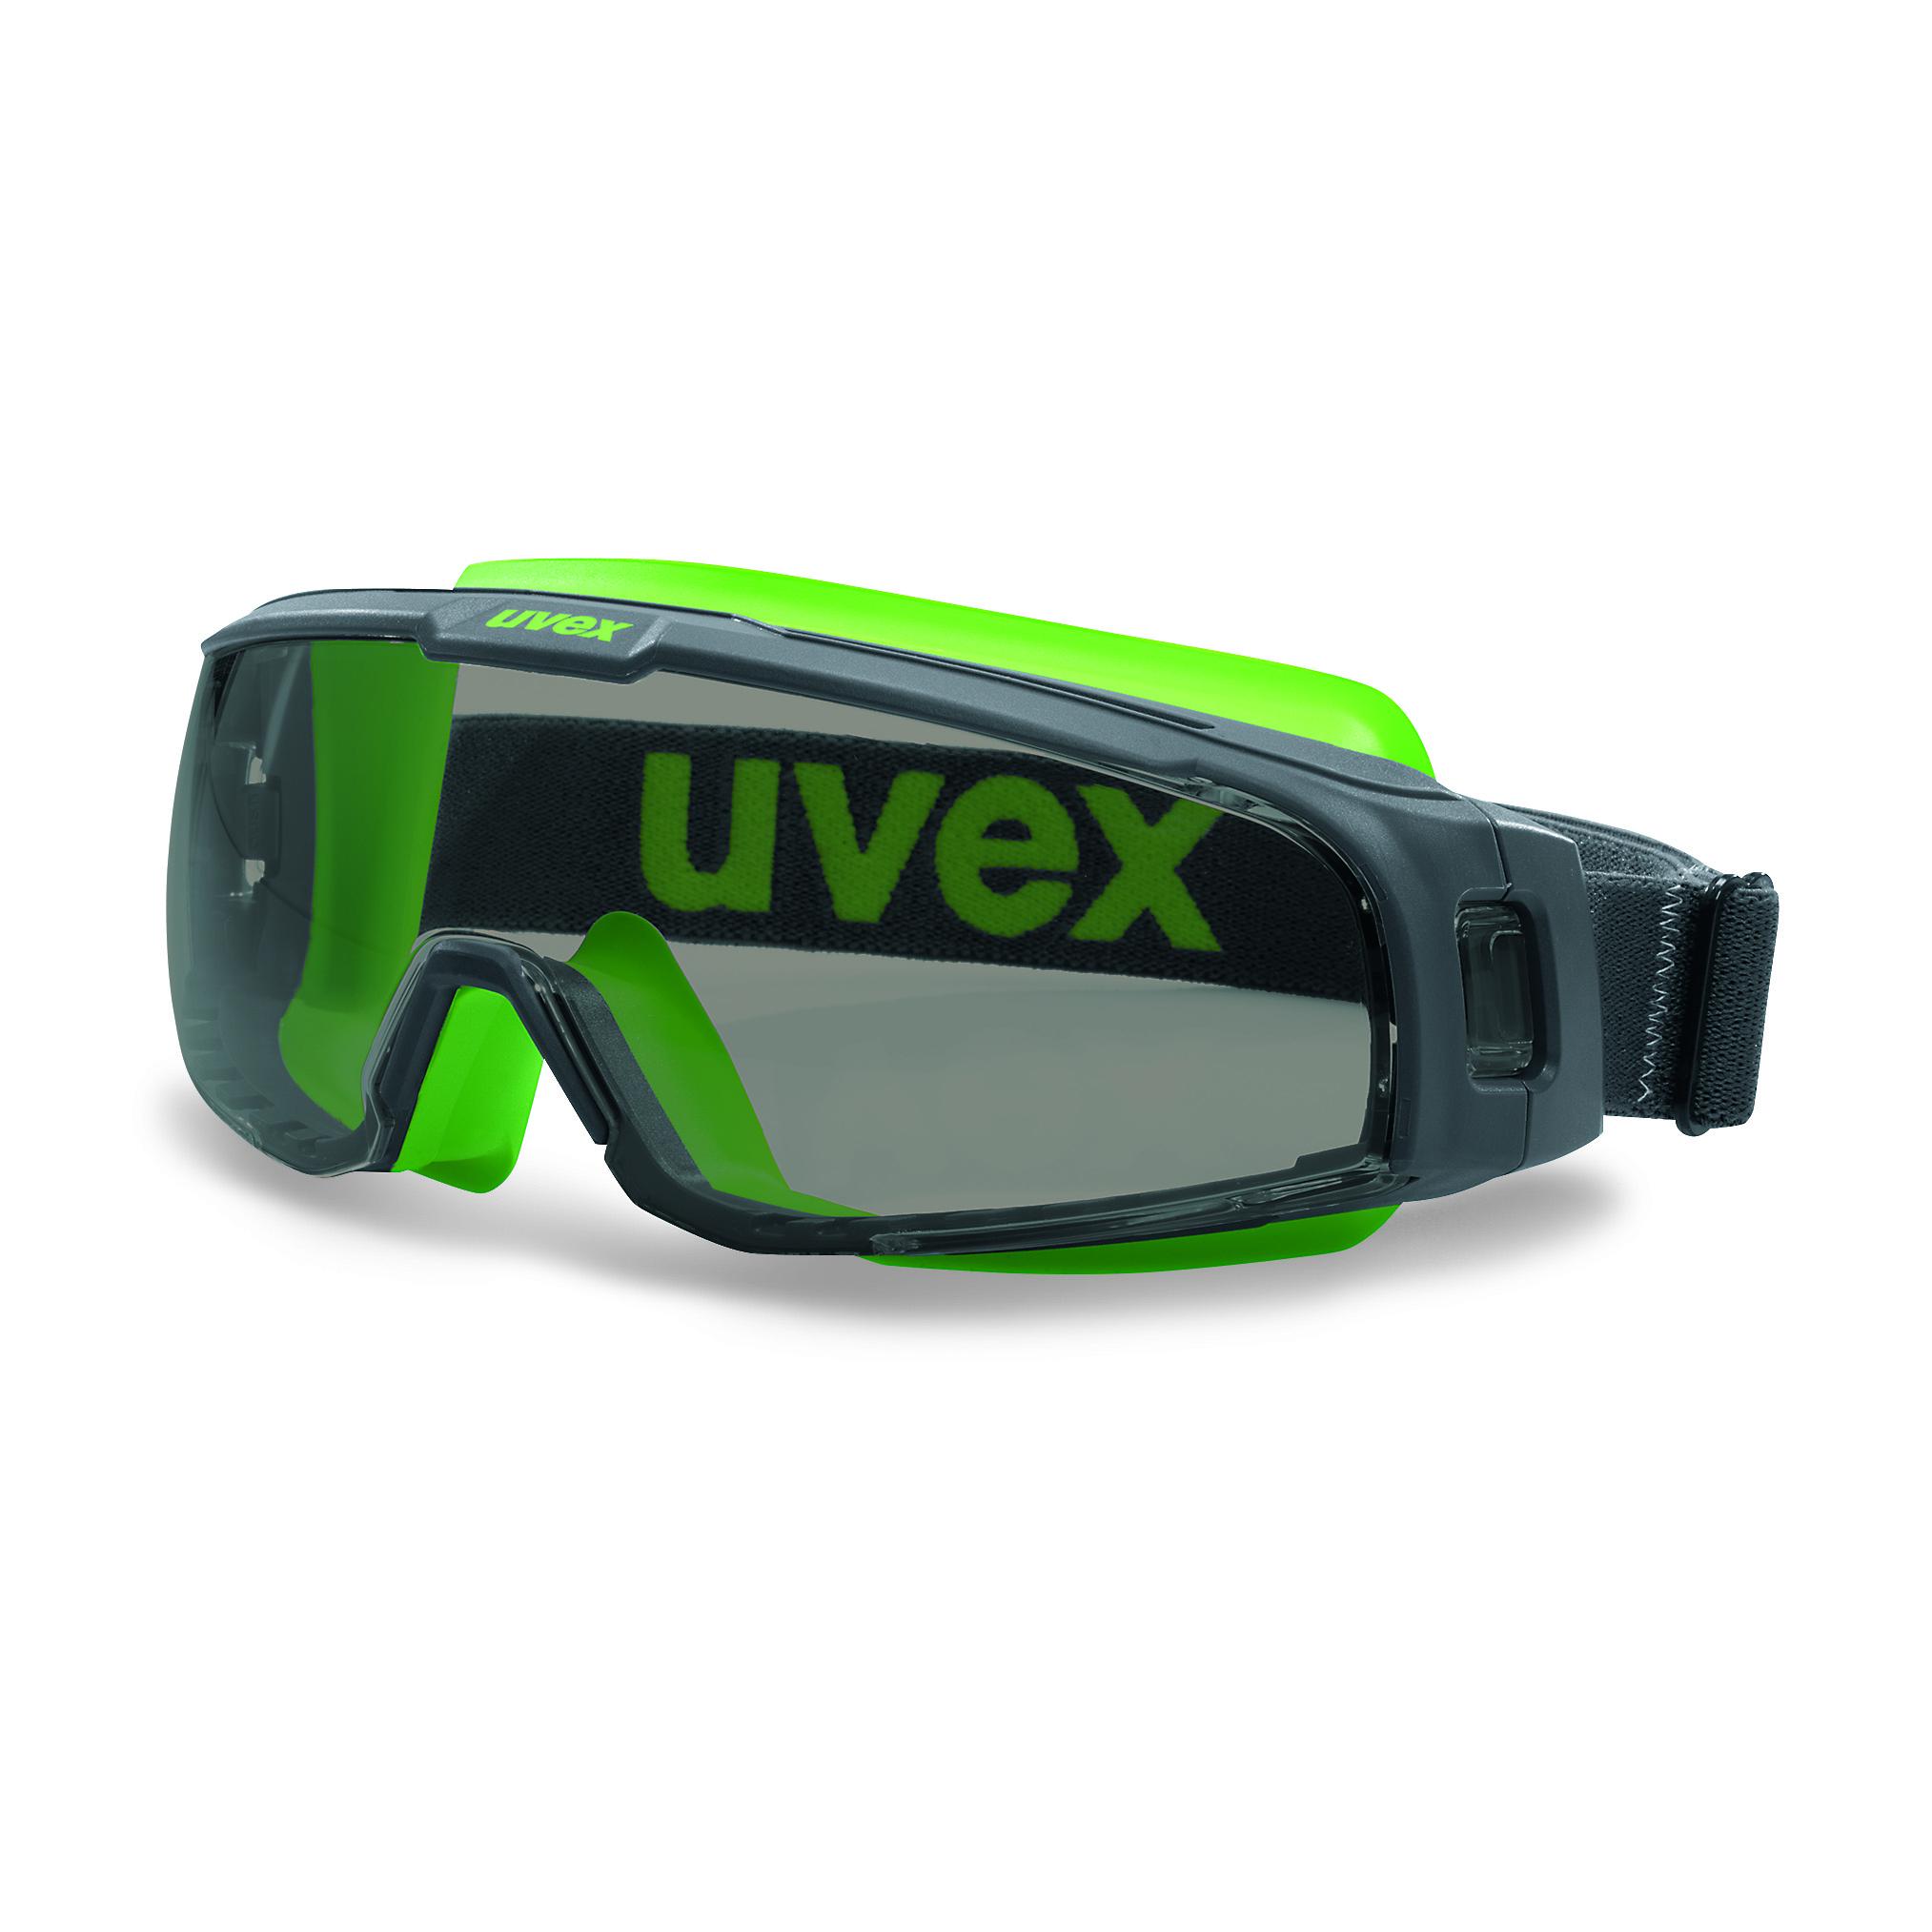 uvex goggle grey